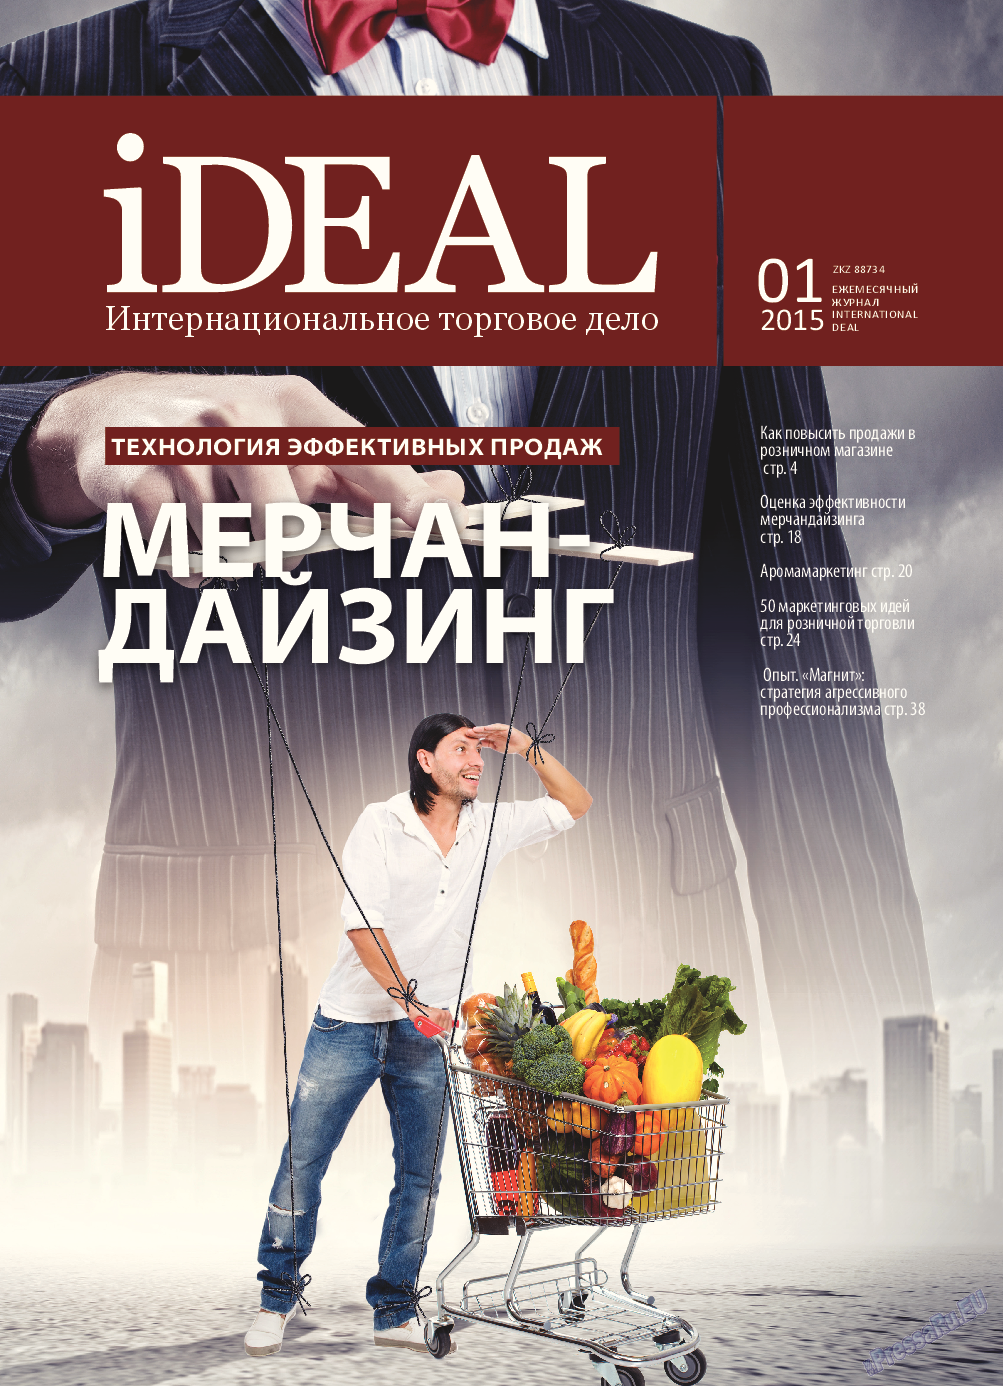 iDEAL (журнал). 2015 год, номер 1, стр. 1